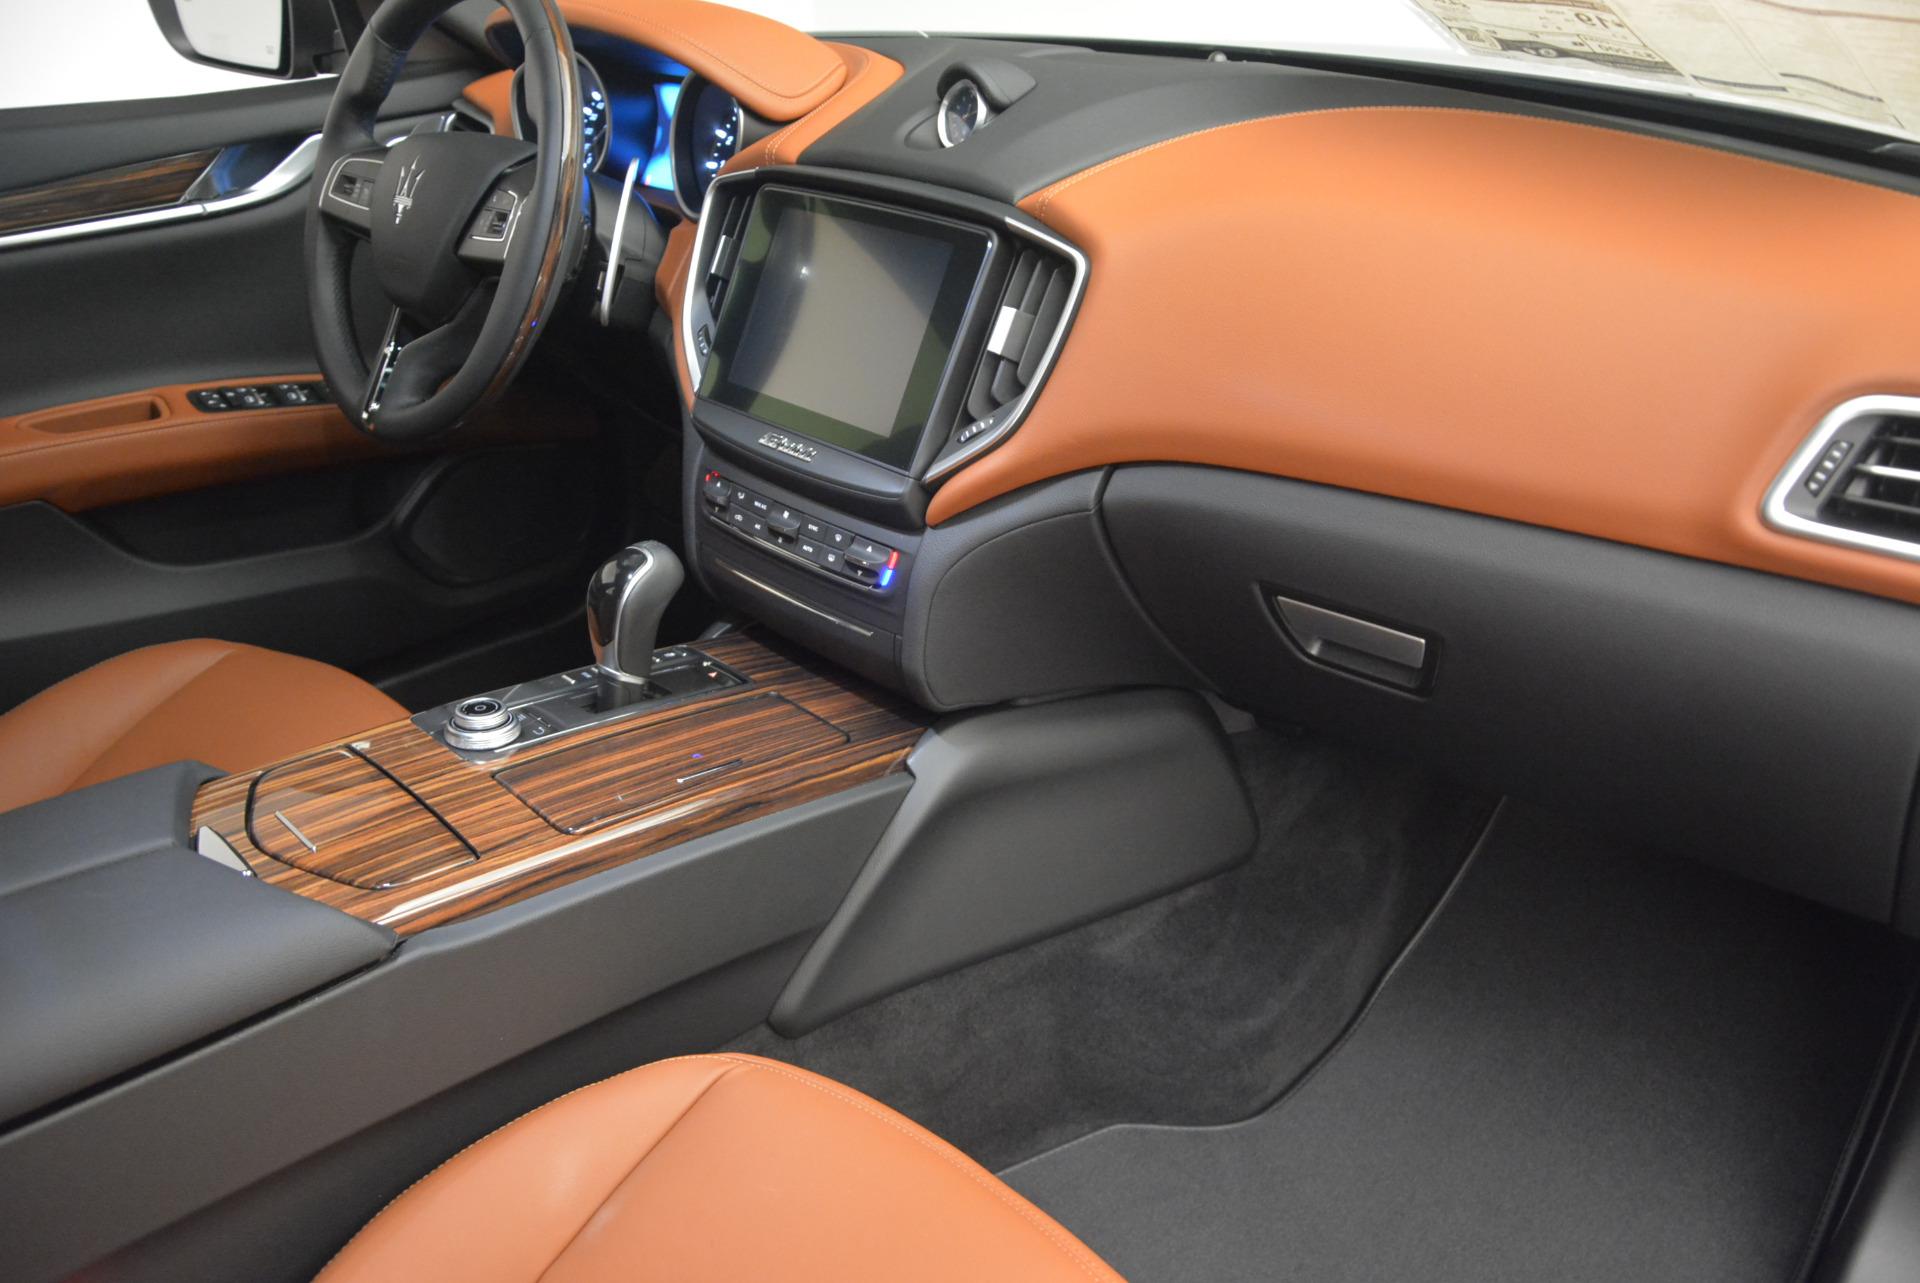 Used 2017 Maserati Ghibli S Q4  EX-LOANER For Sale In Greenwich, CT. Alfa Romeo of Greenwich, W311 565_p19